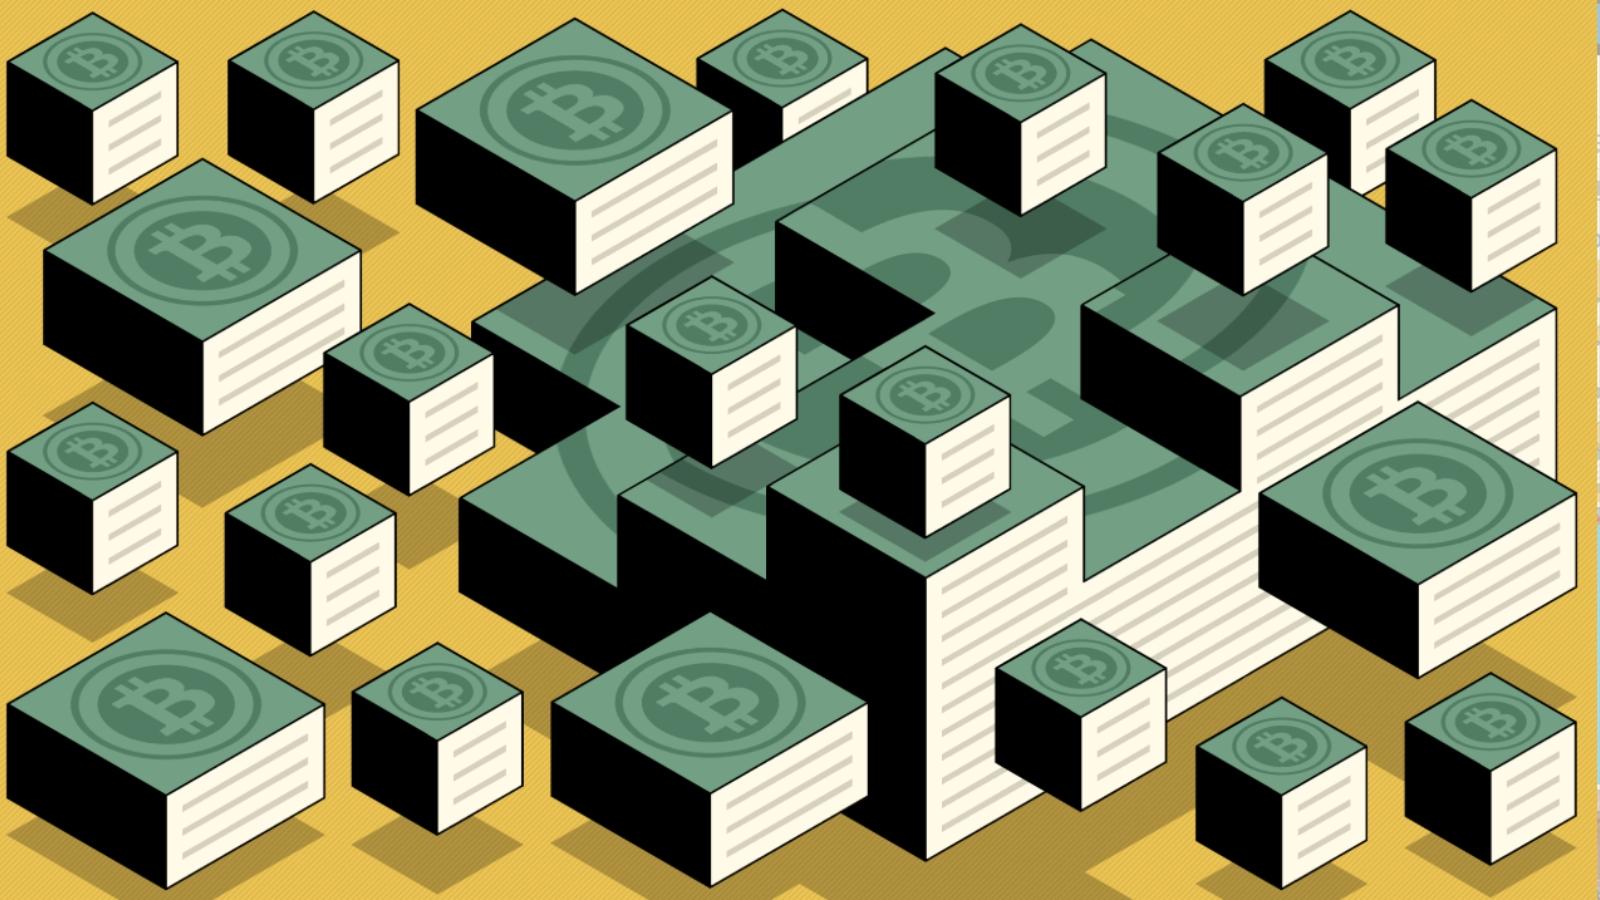 bitcoin volatility, btc wallet, btc price analysis, crypto loans, btc loans